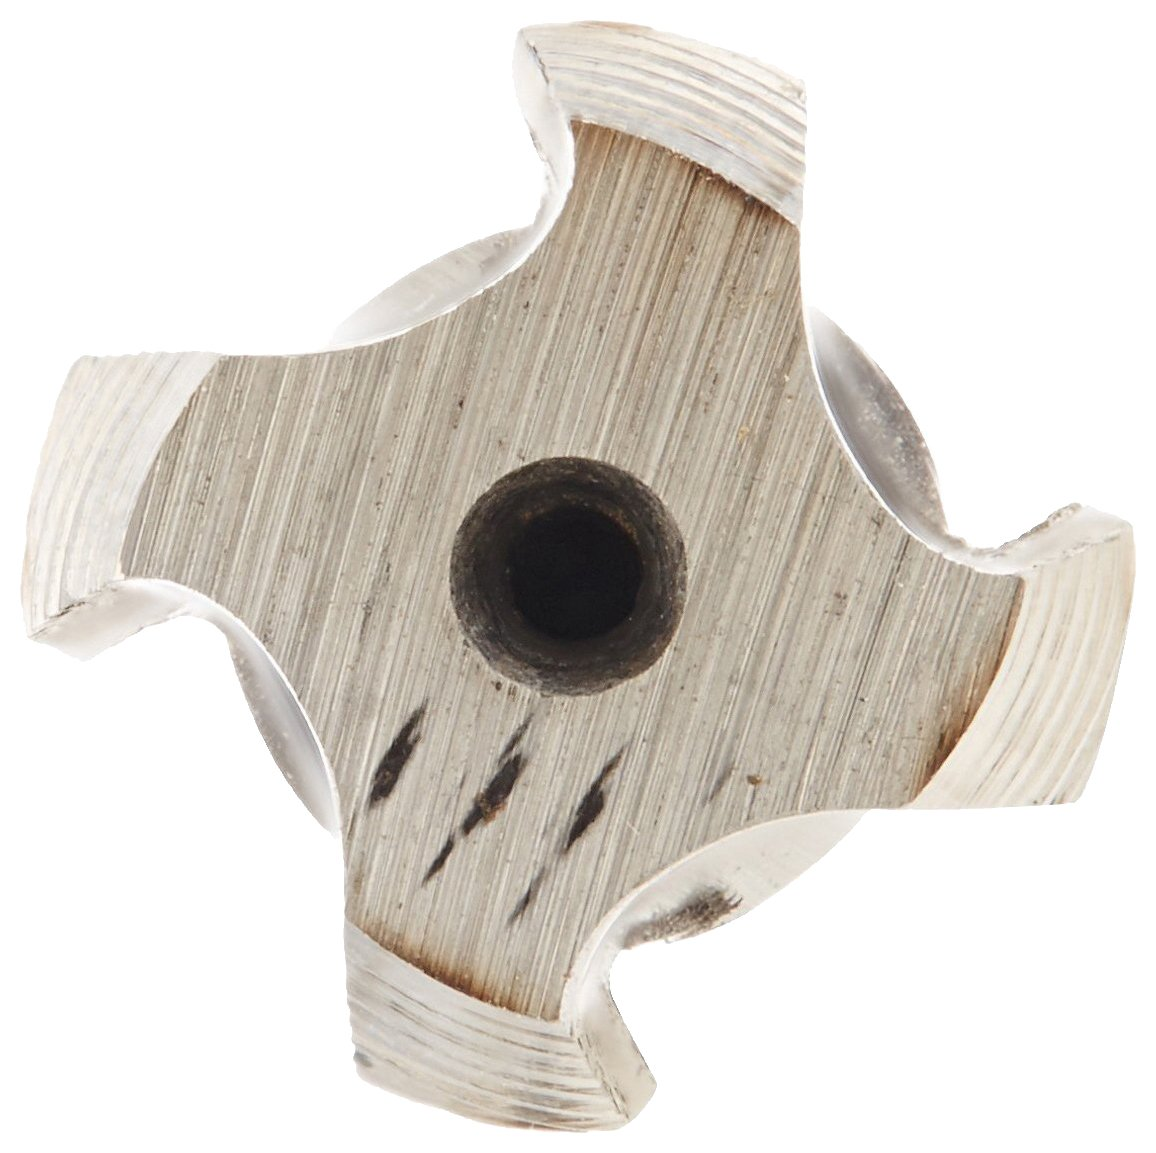 3//8-16 Carbon Steel Taper Tap DWT Series Pack of 1